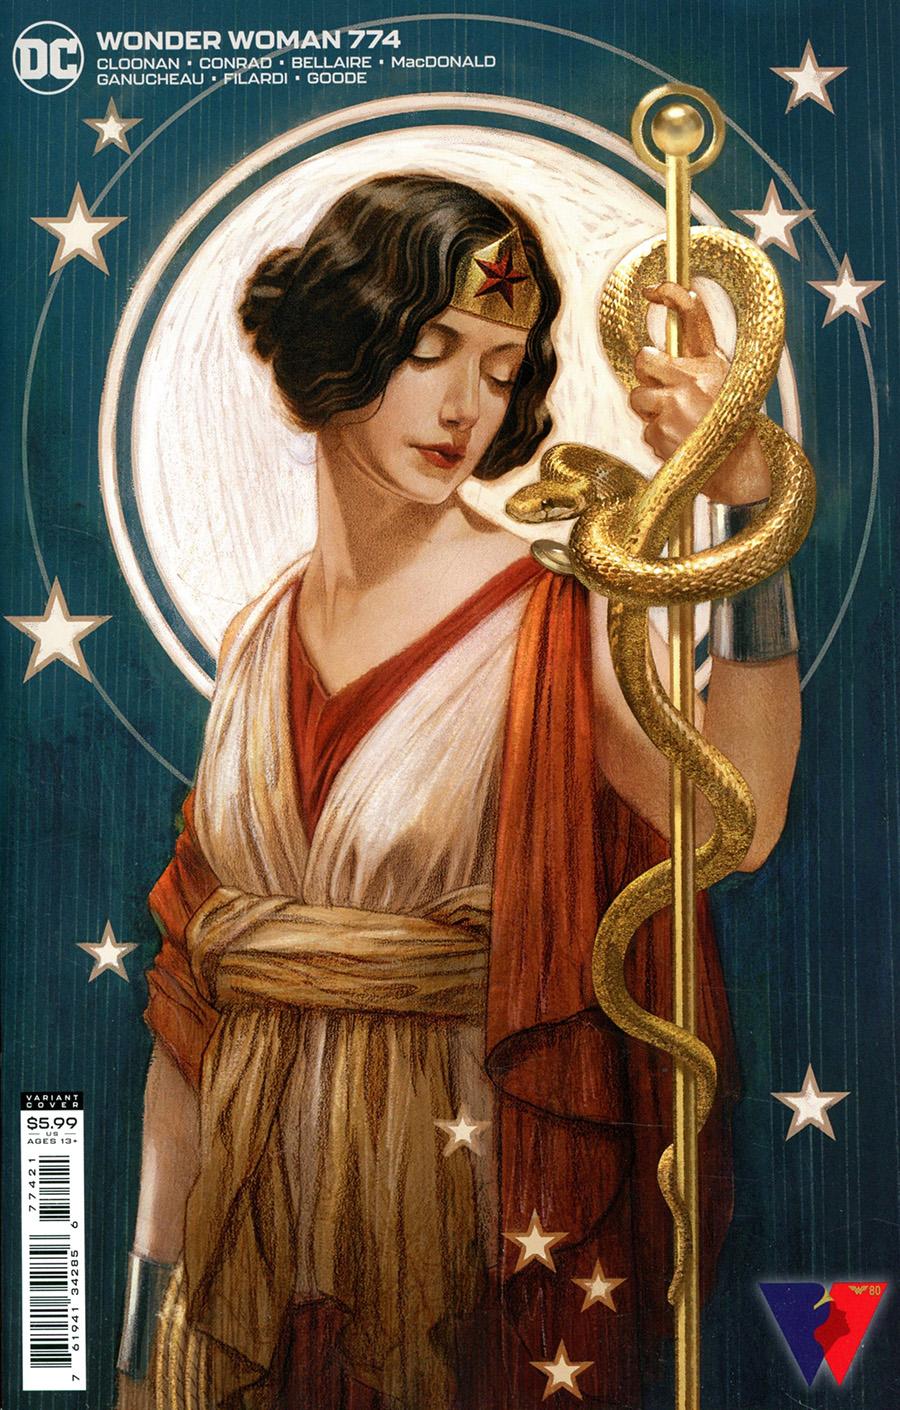 Wonder Woman Vol 5 #774 Cover B Variant Joshua Middleton Card Stock Cover